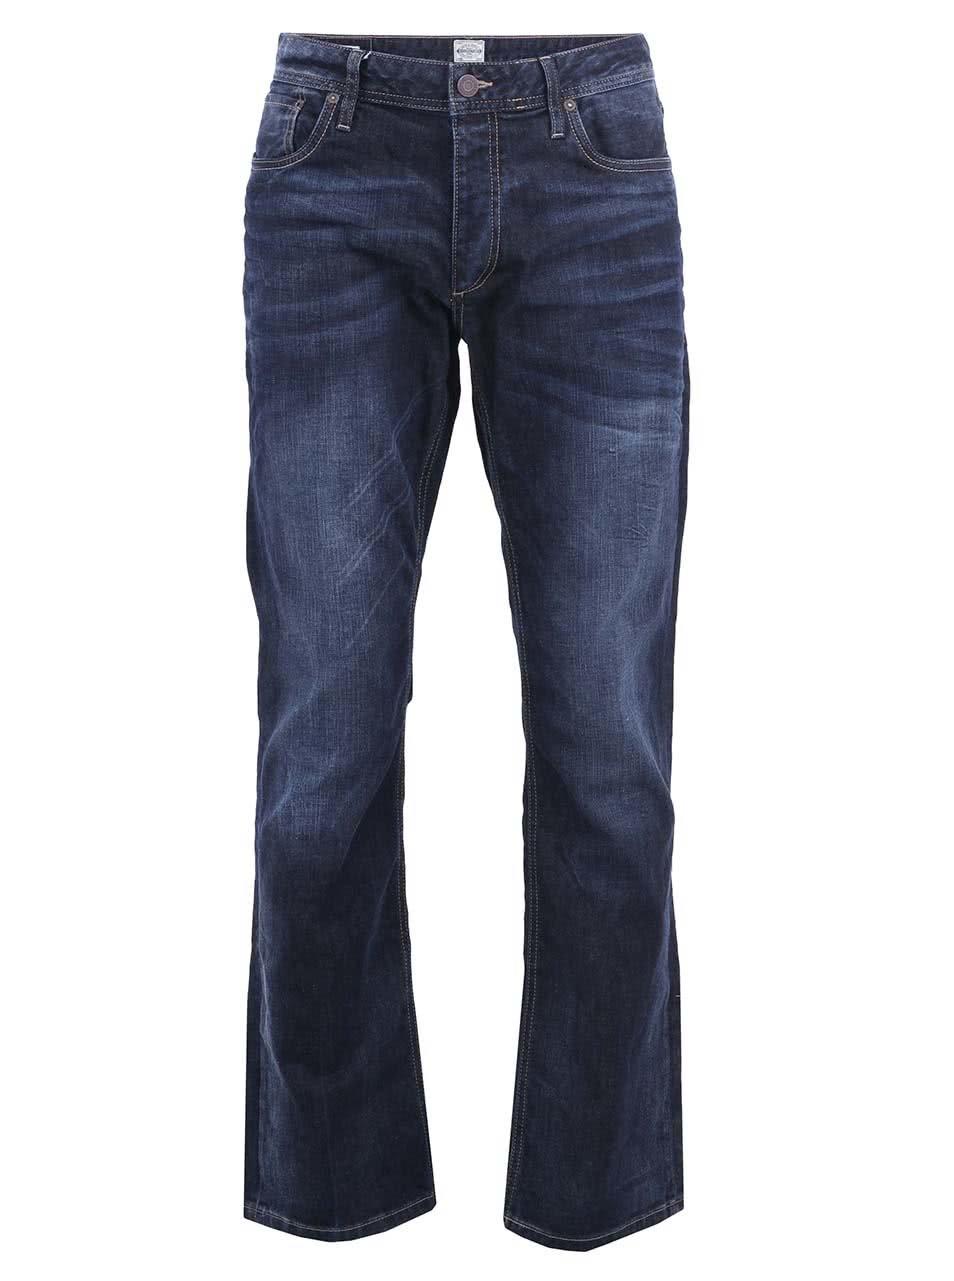 Modré džíny Jack & Jones Clark Original